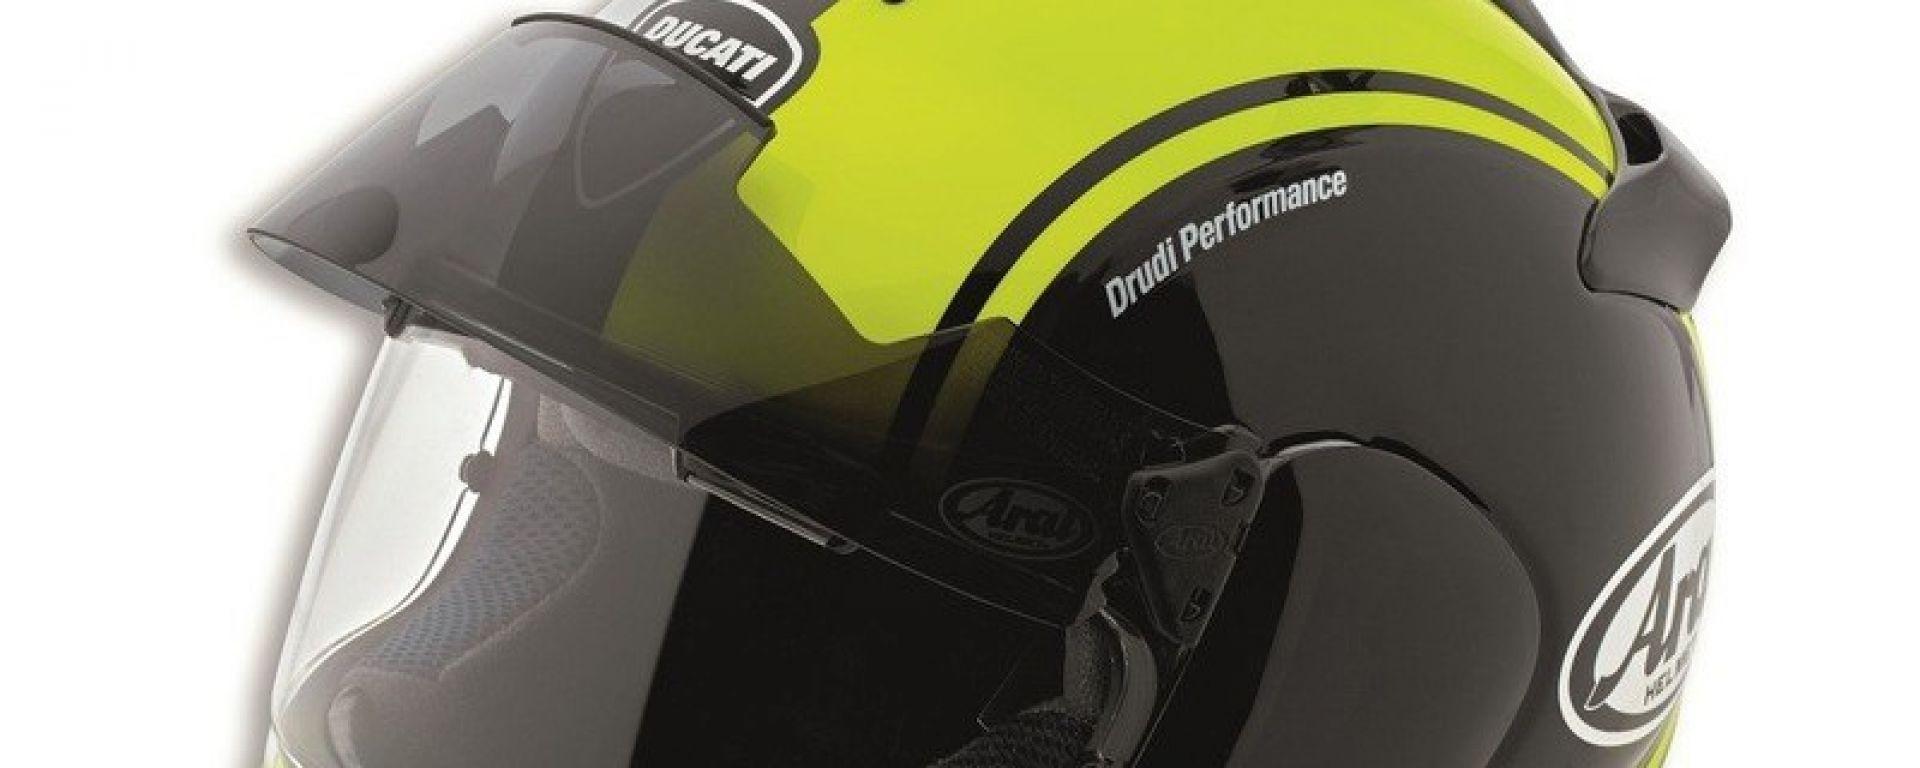 Arai HV-1 Pro by Ducati